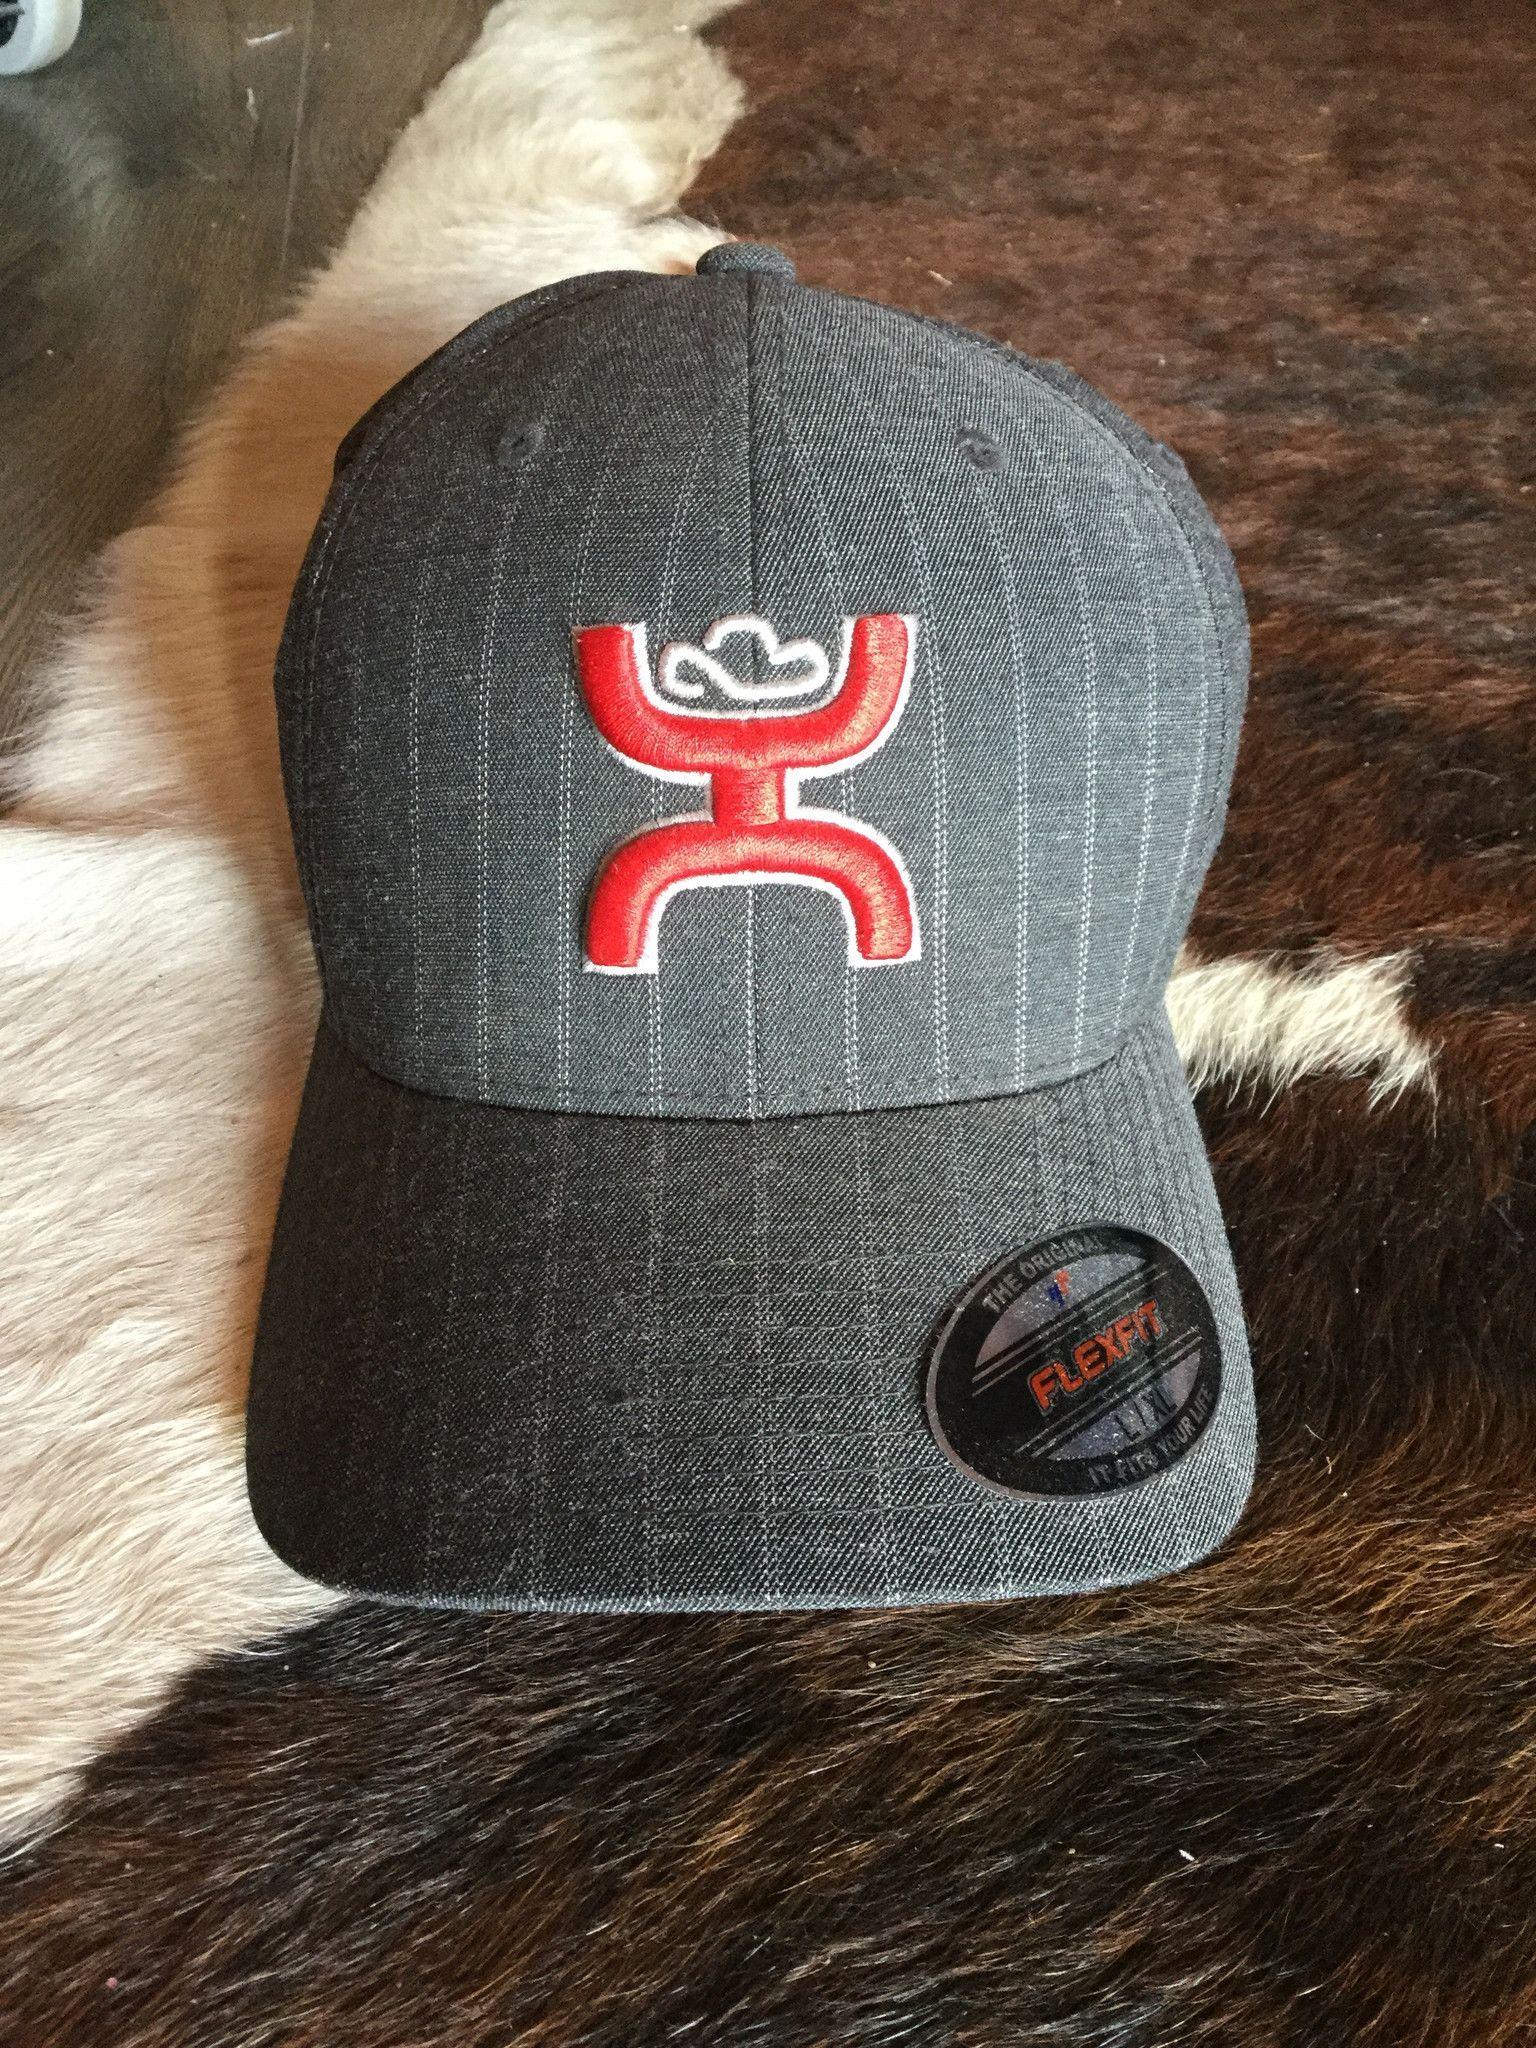 cb52aee21e2f Hooey Pin Striped Hat | It's just me! | Pinterest | Hooey hats